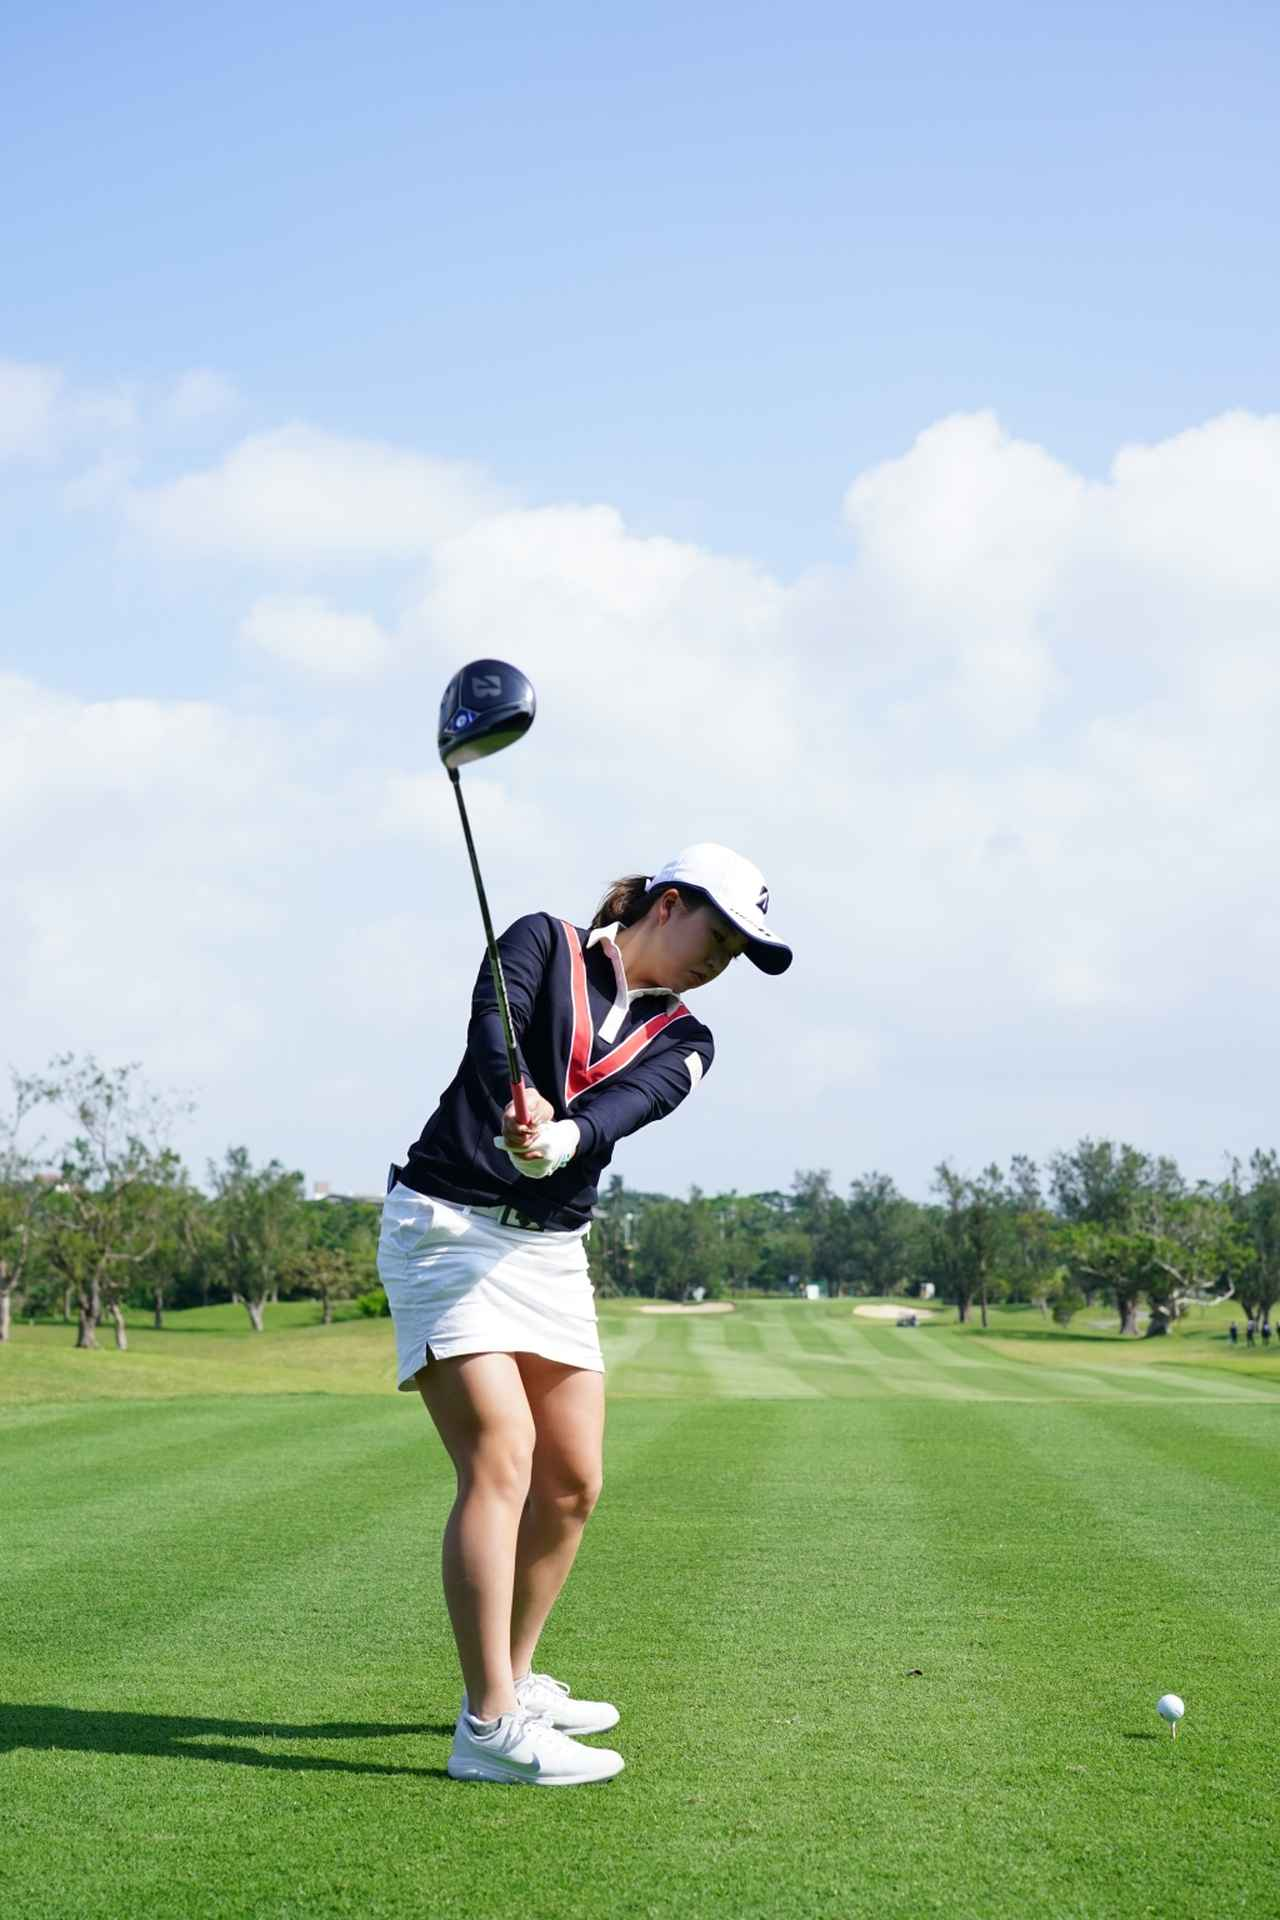 Images : 3番目の画像 - 丹萌乃のドライバー連続写真 - みんなのゴルフダイジェスト